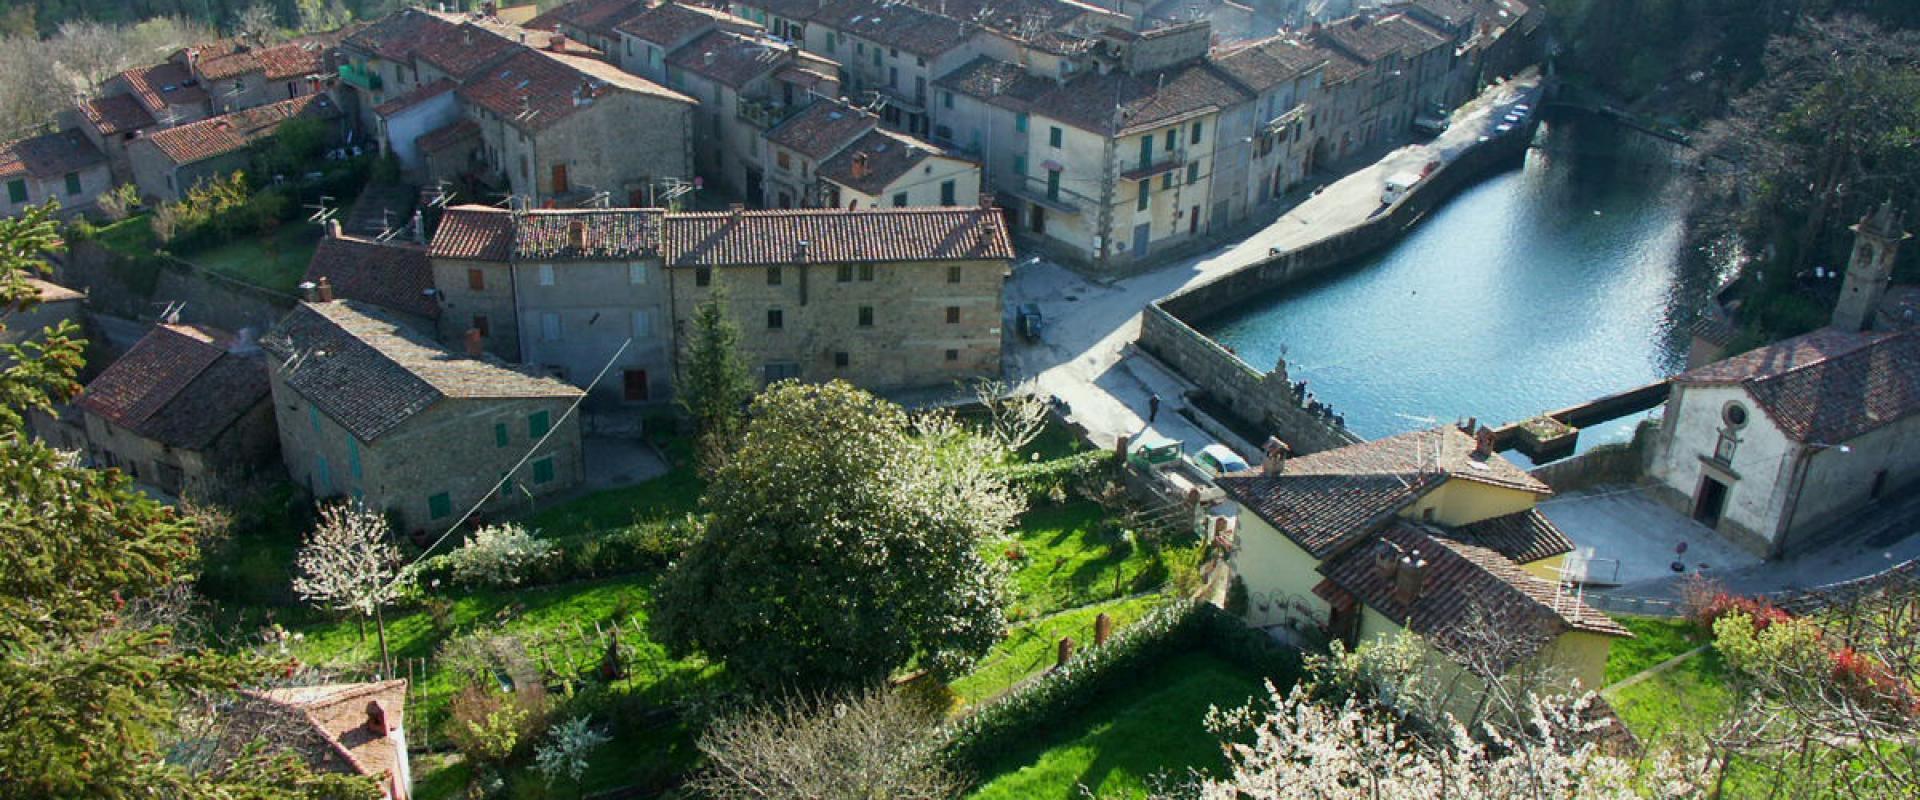 Visit of the springs of Santa Fiora